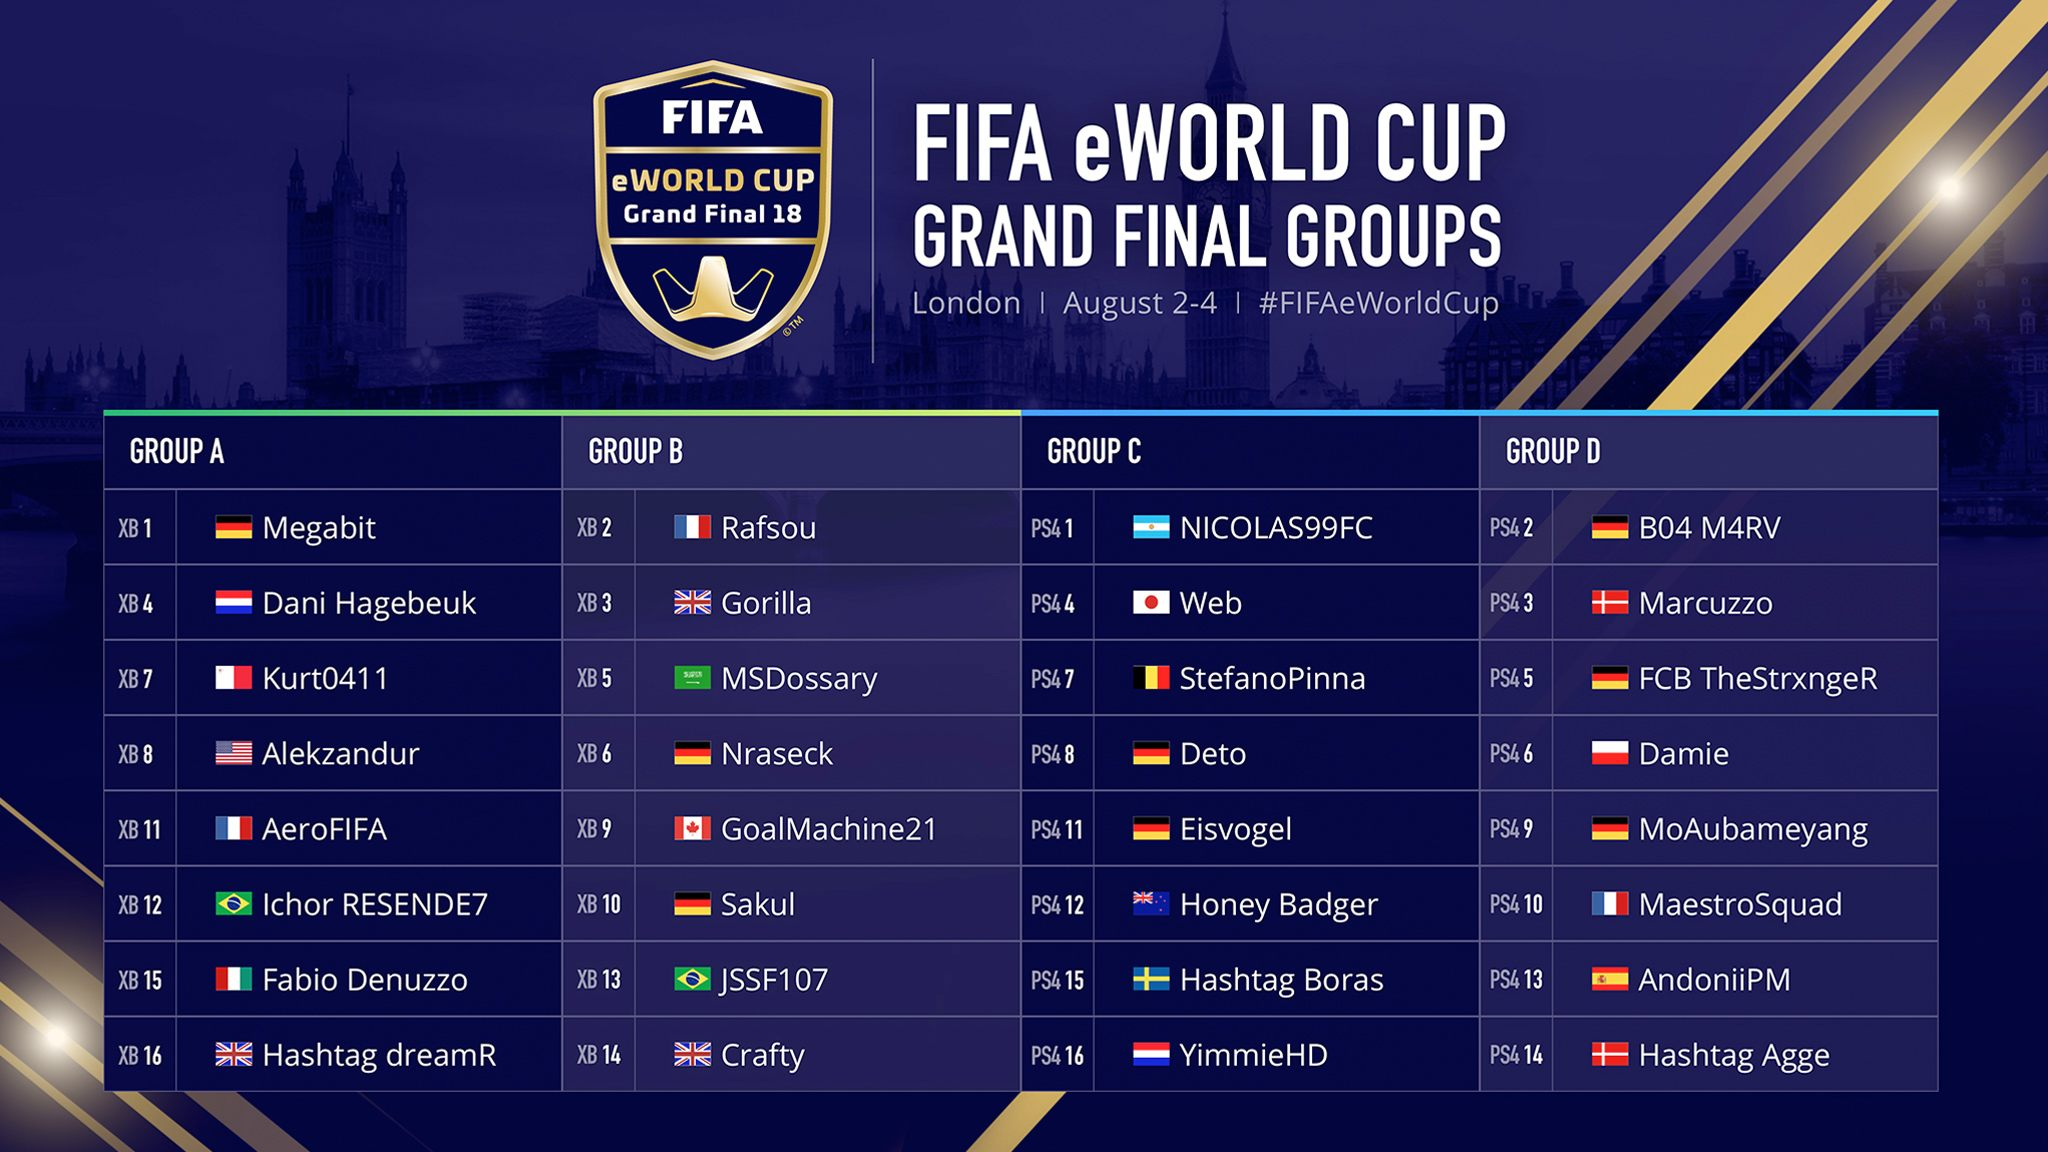 eWorld Cup 2018 Fixtures